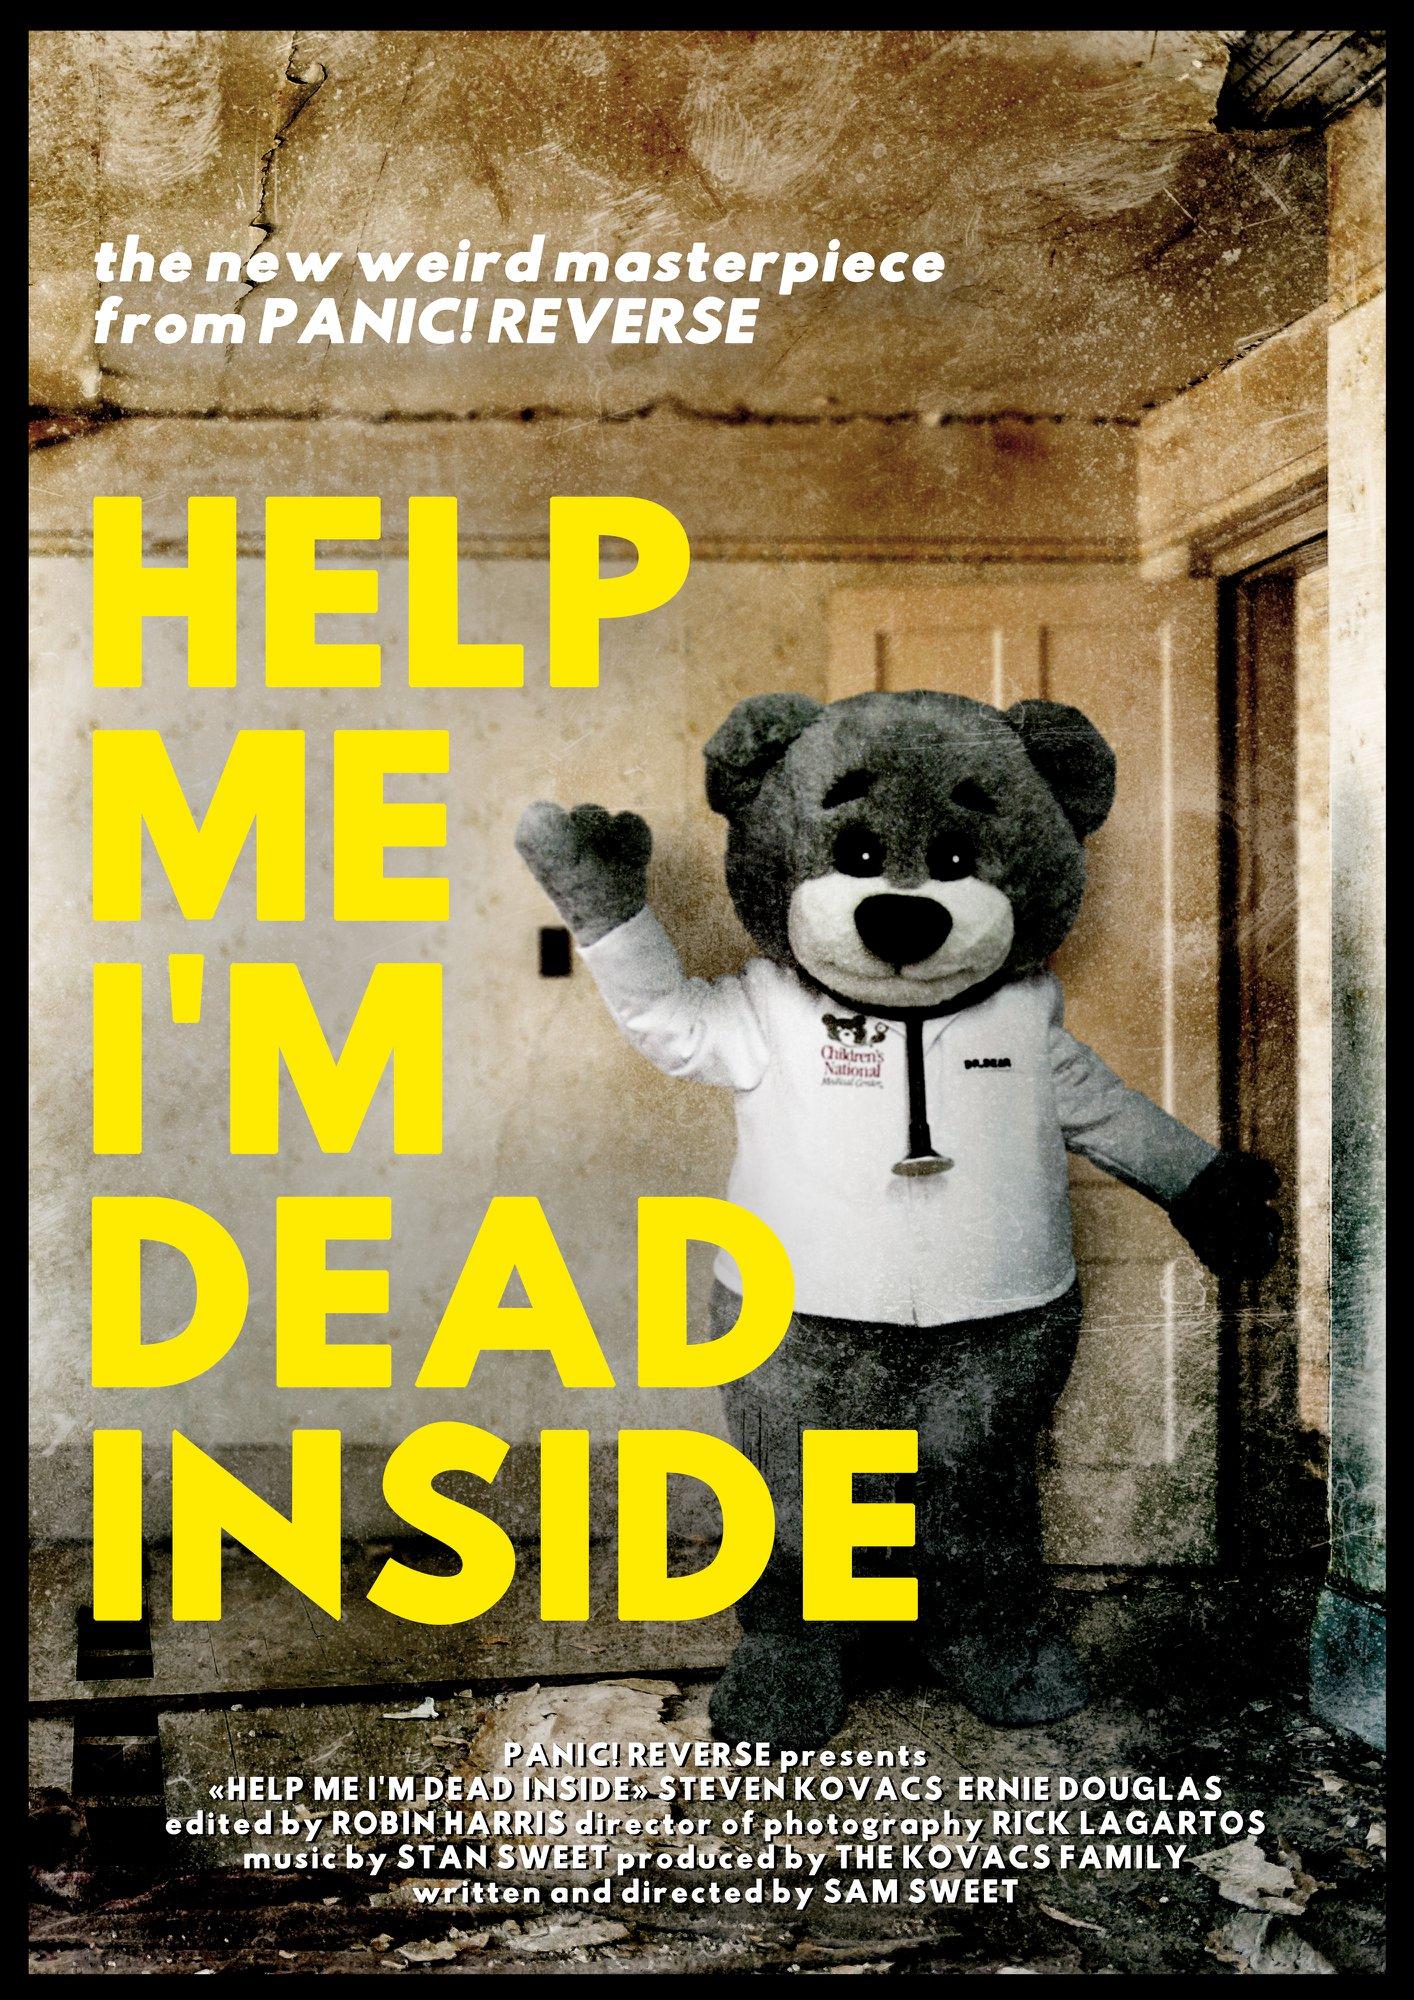 Help me I'm dead inside - Bruno Bovo